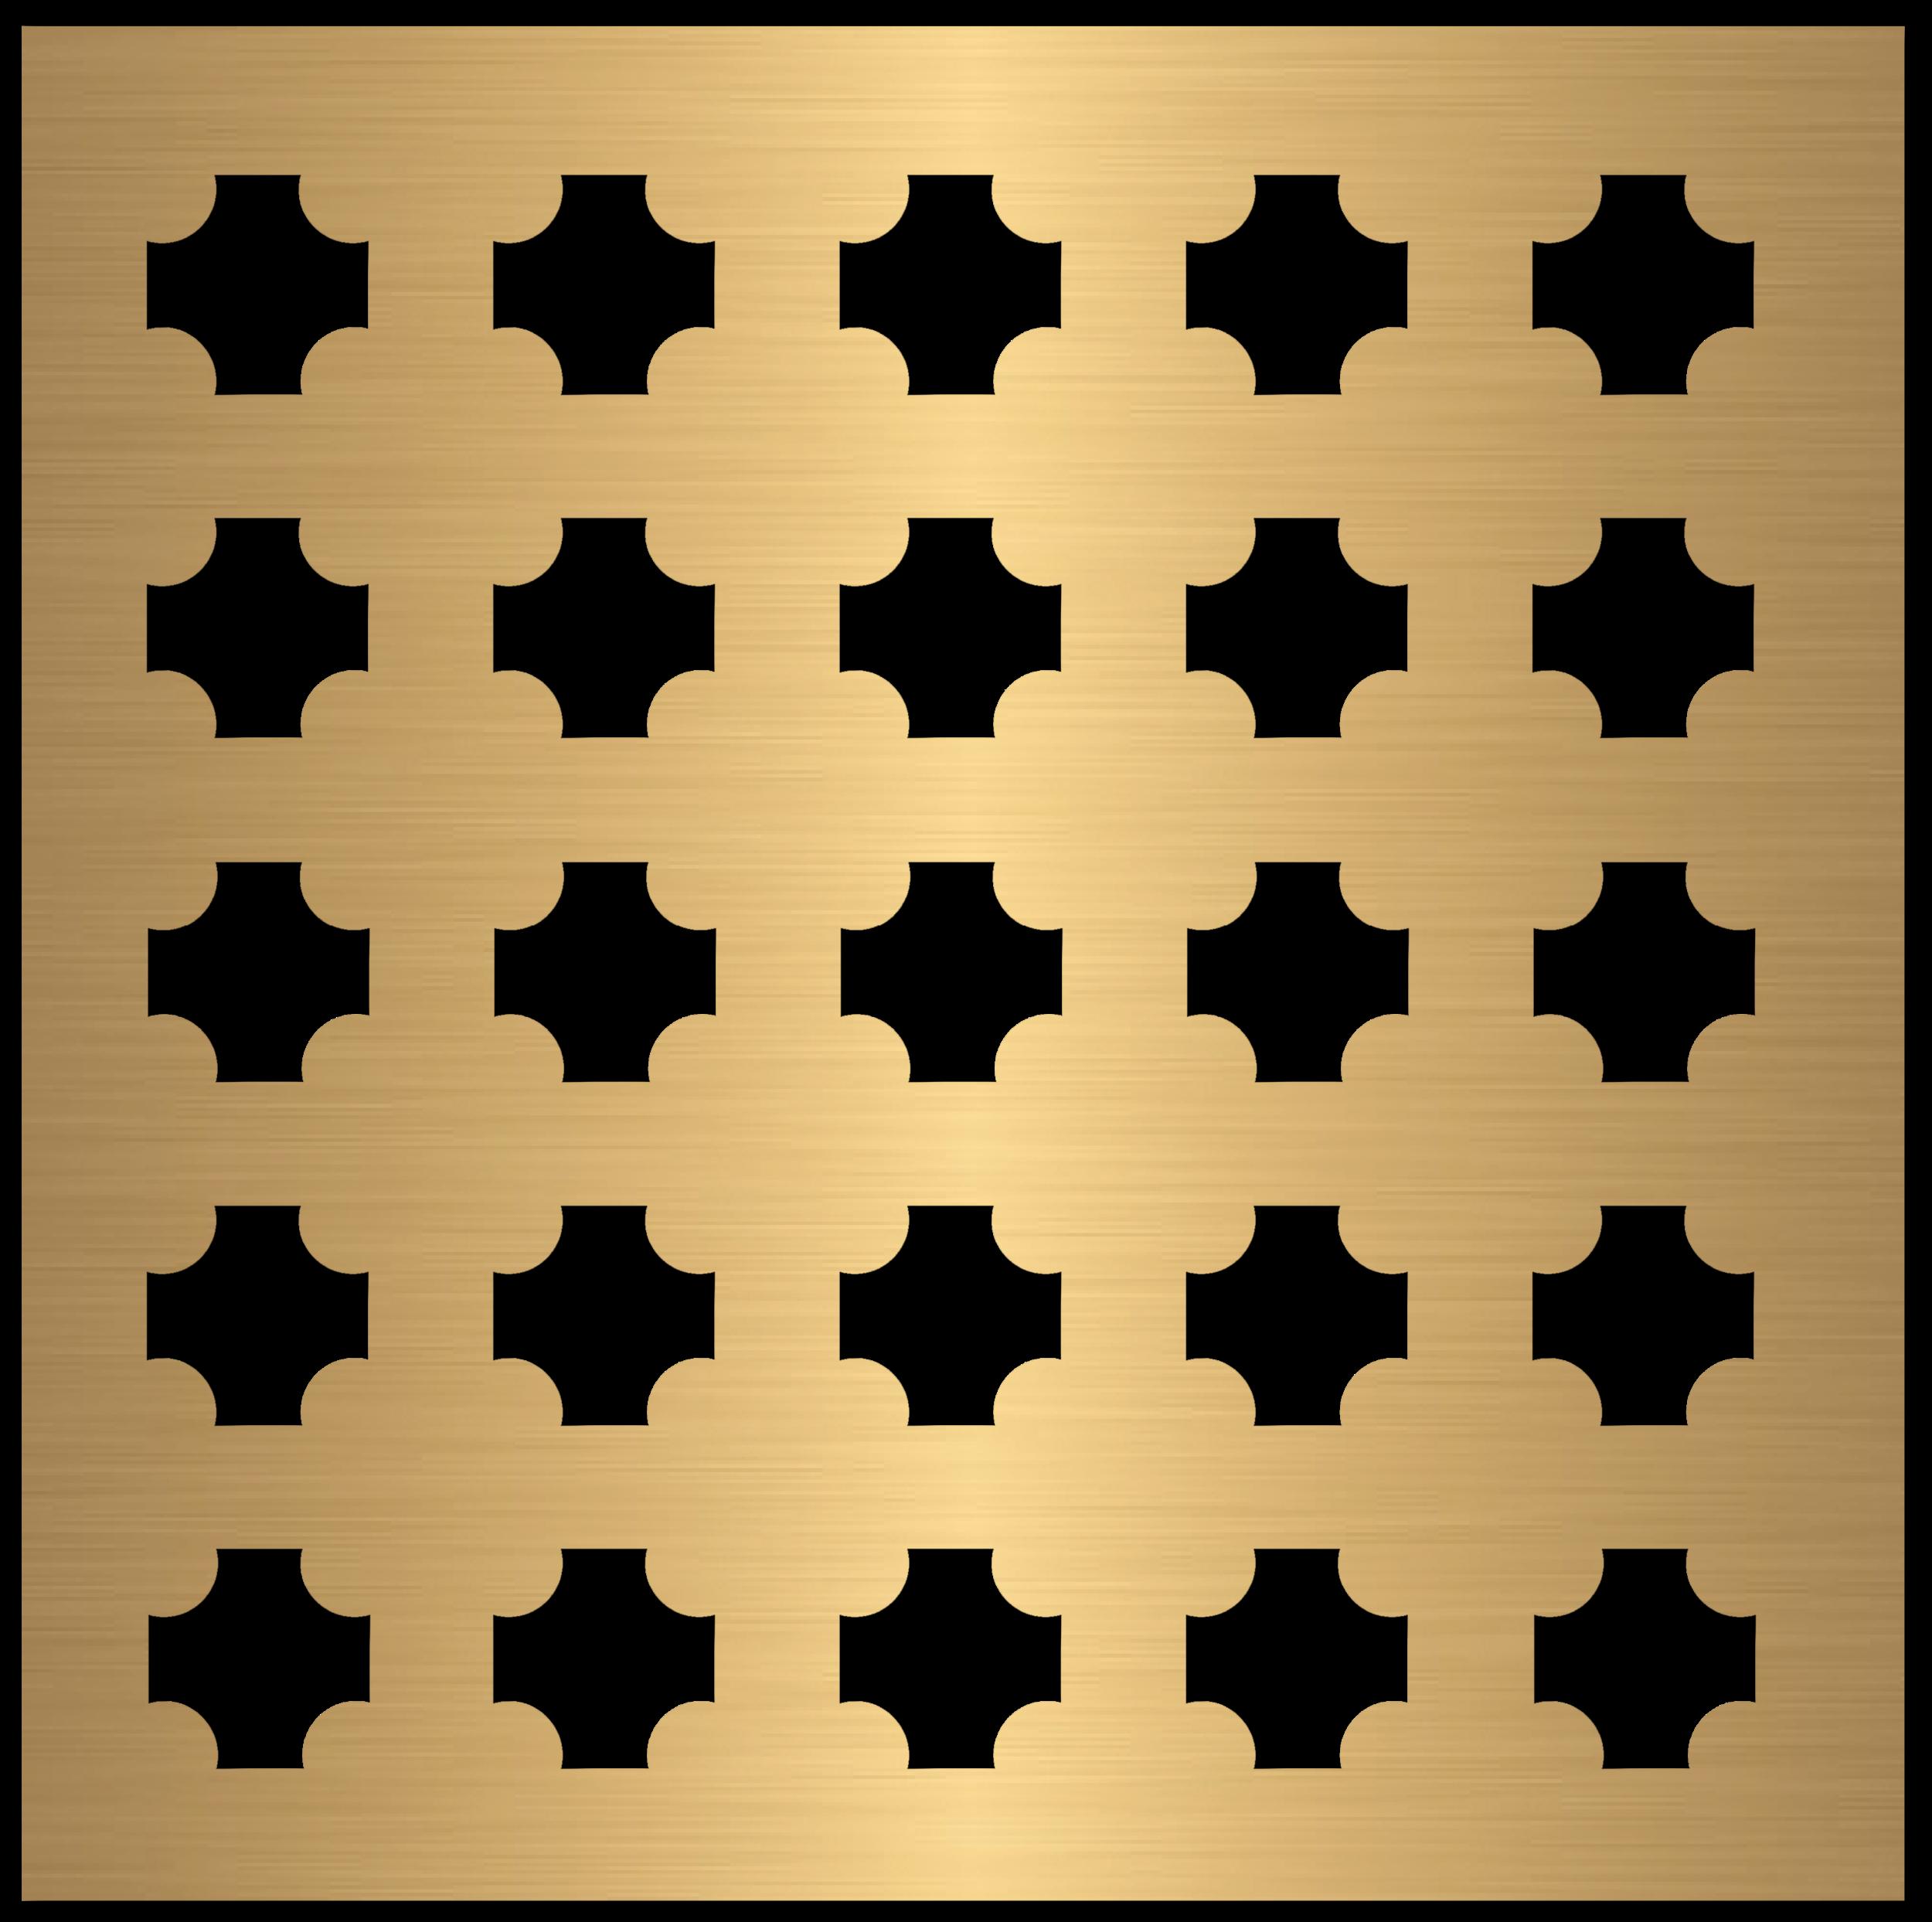 Square Cross